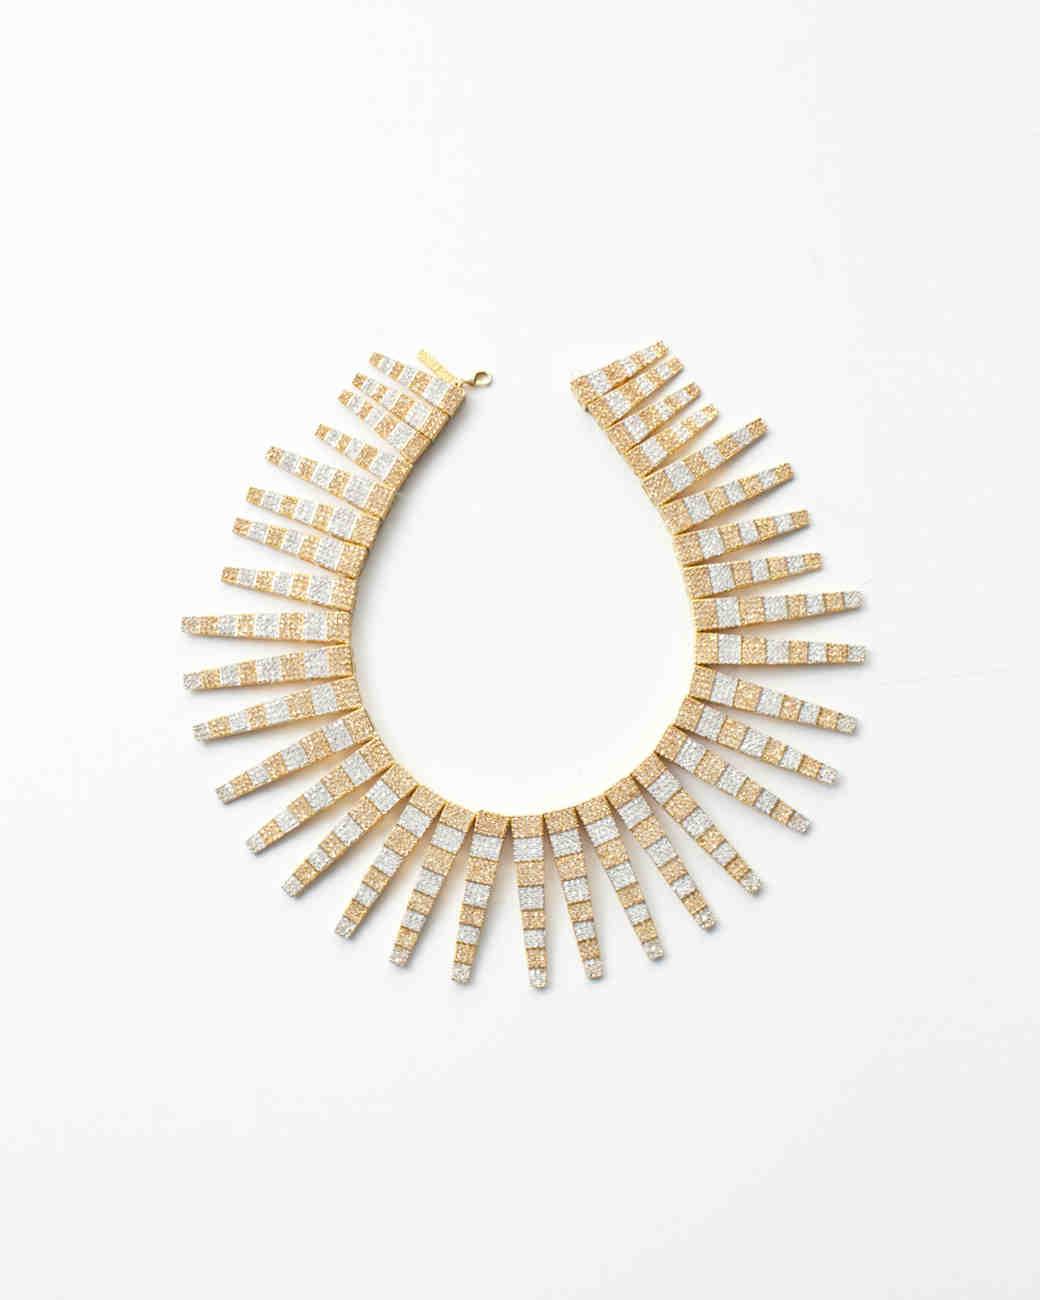 necklace-wd108931.jpg